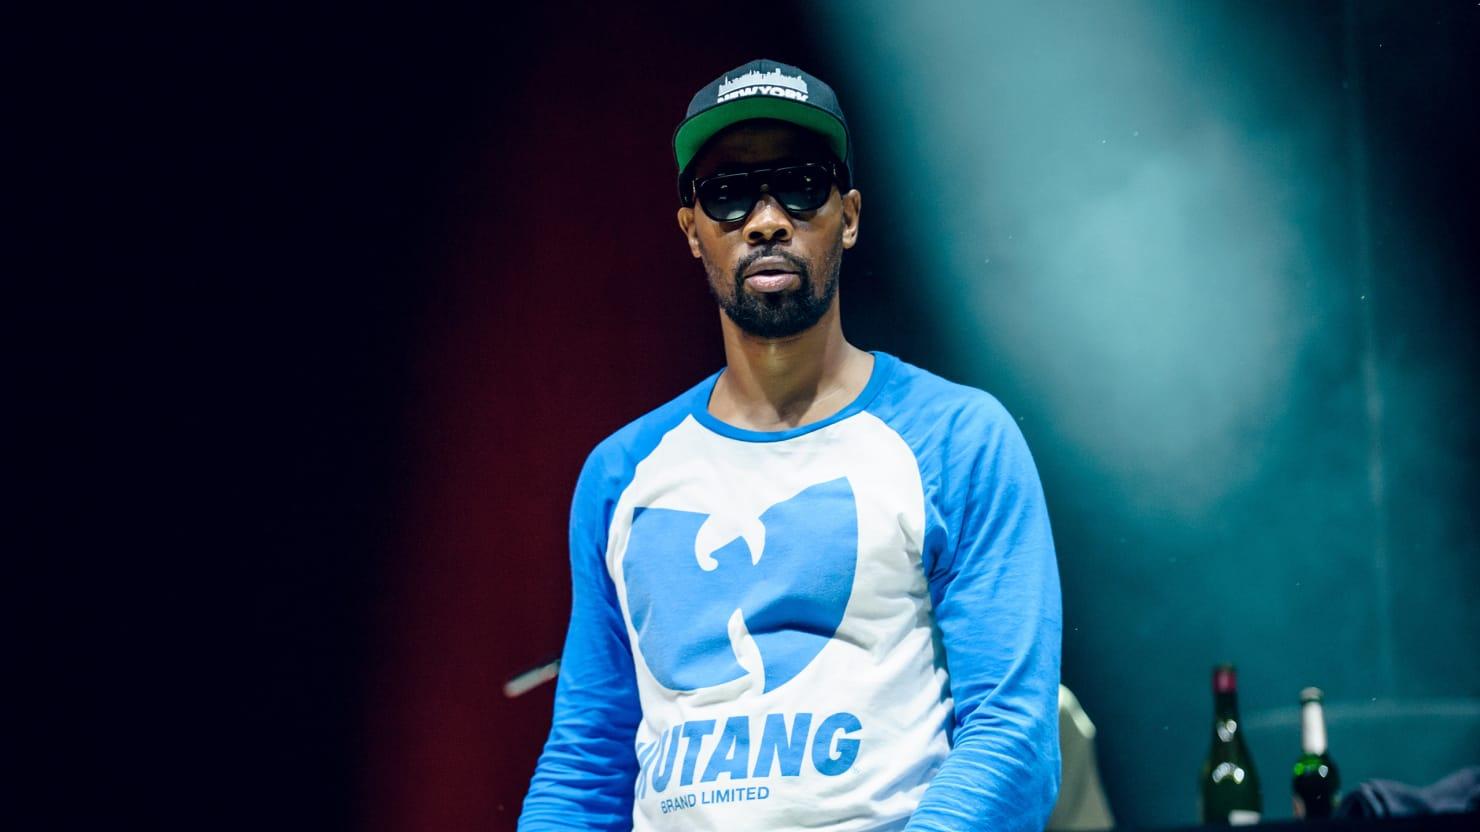 Wu-Tang's RZA Discusses the 'Blurred Lines' Verdict: 'Pretty Close to the Original, Yo'